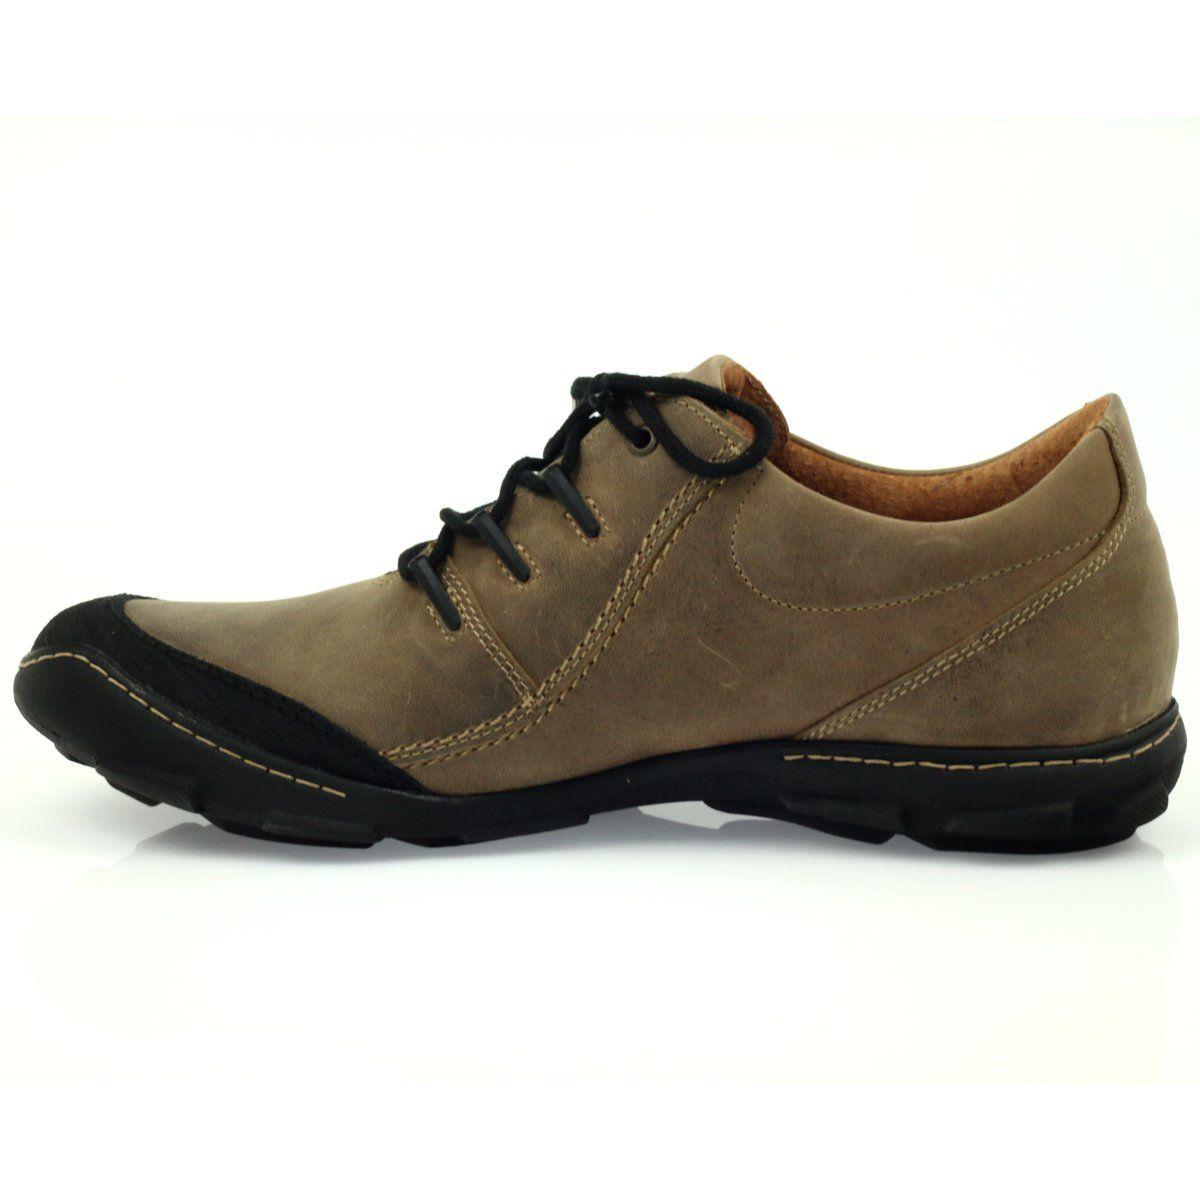 Badura 2159 Polbuty Sportowe Komfortowe Czarne Brazowe Hiking Boots Boots Sneakers